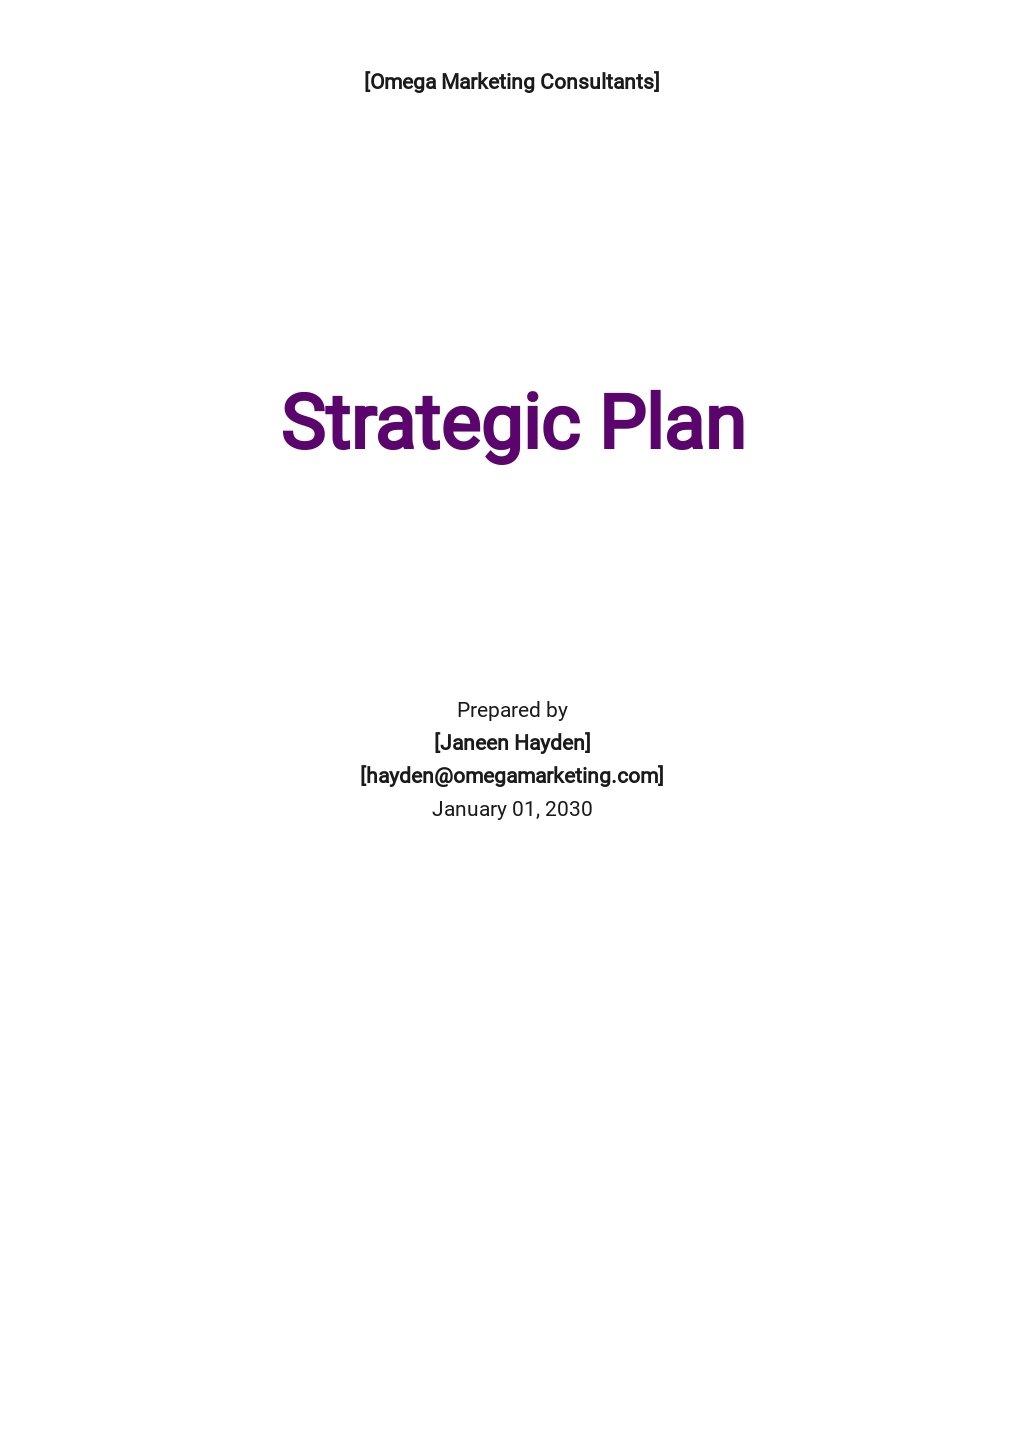 Blank Strategic Plan Template